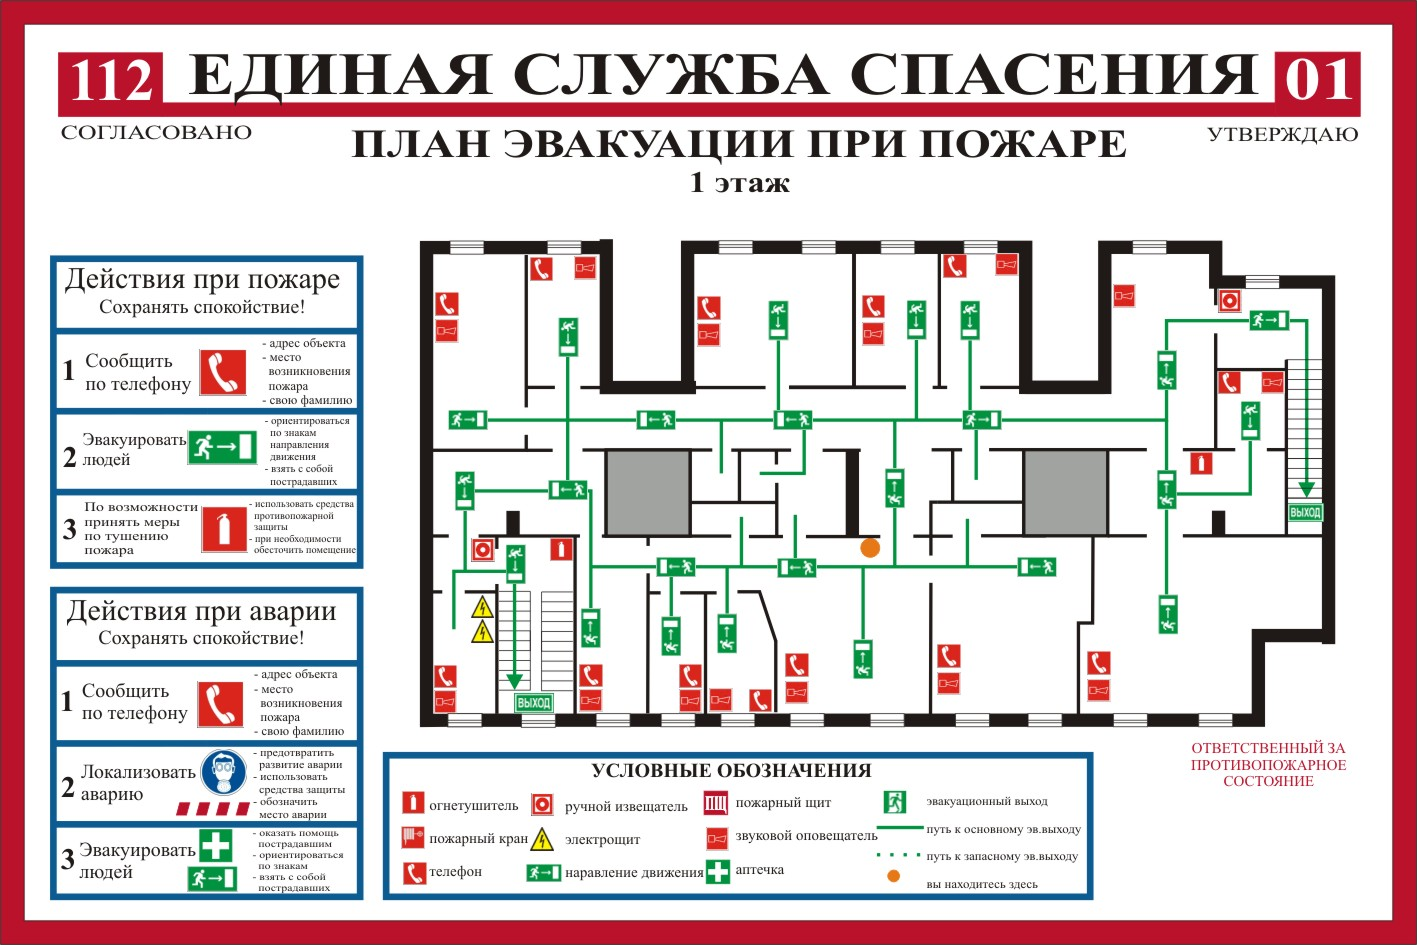 Картинки плане эвакуации